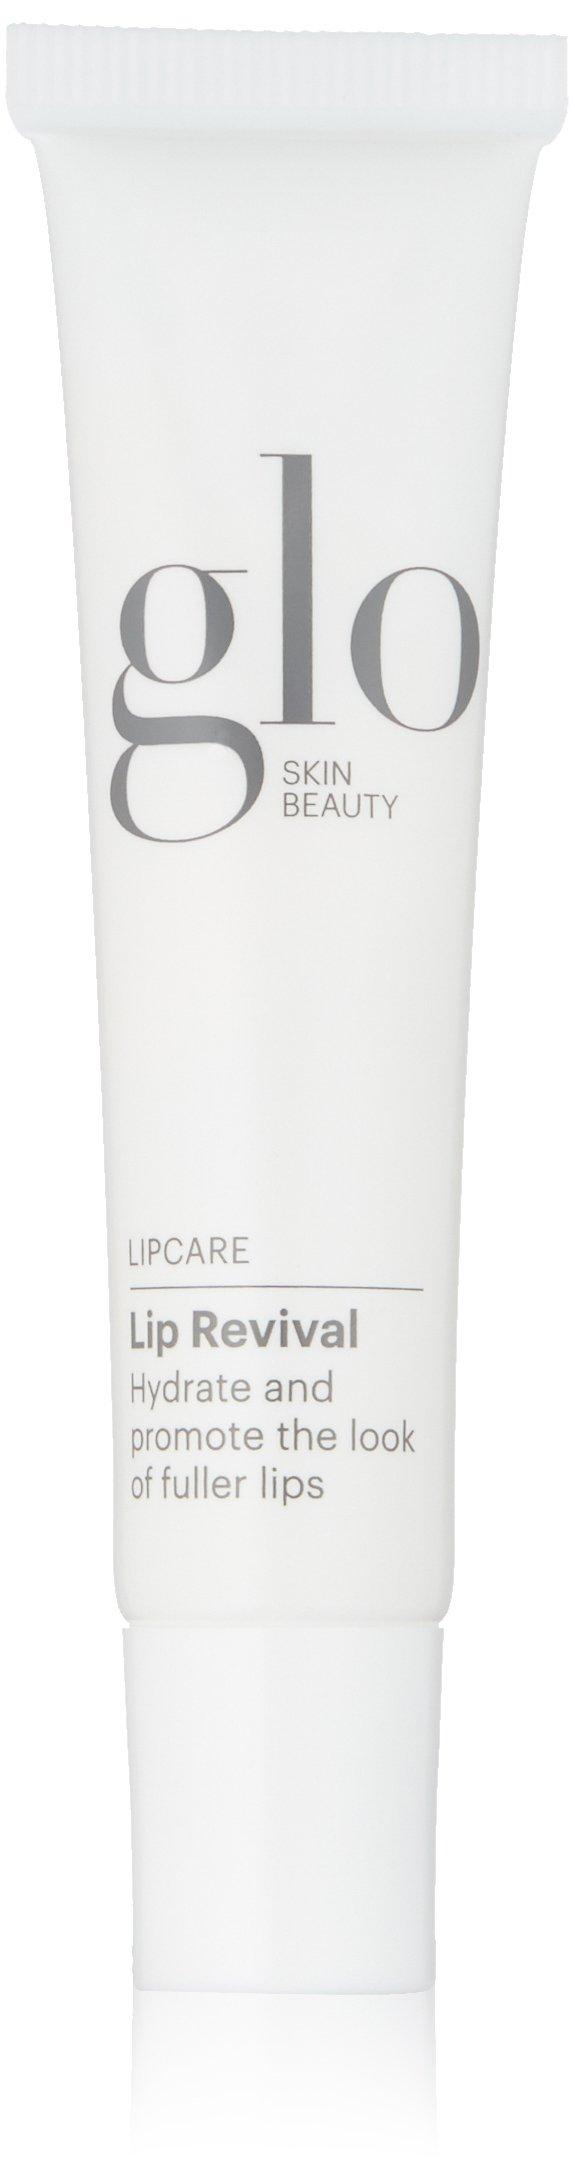 Glo Skin Beauty Lip Revival - Hydrating Lip Care Cream, 0.5 fl. oz.